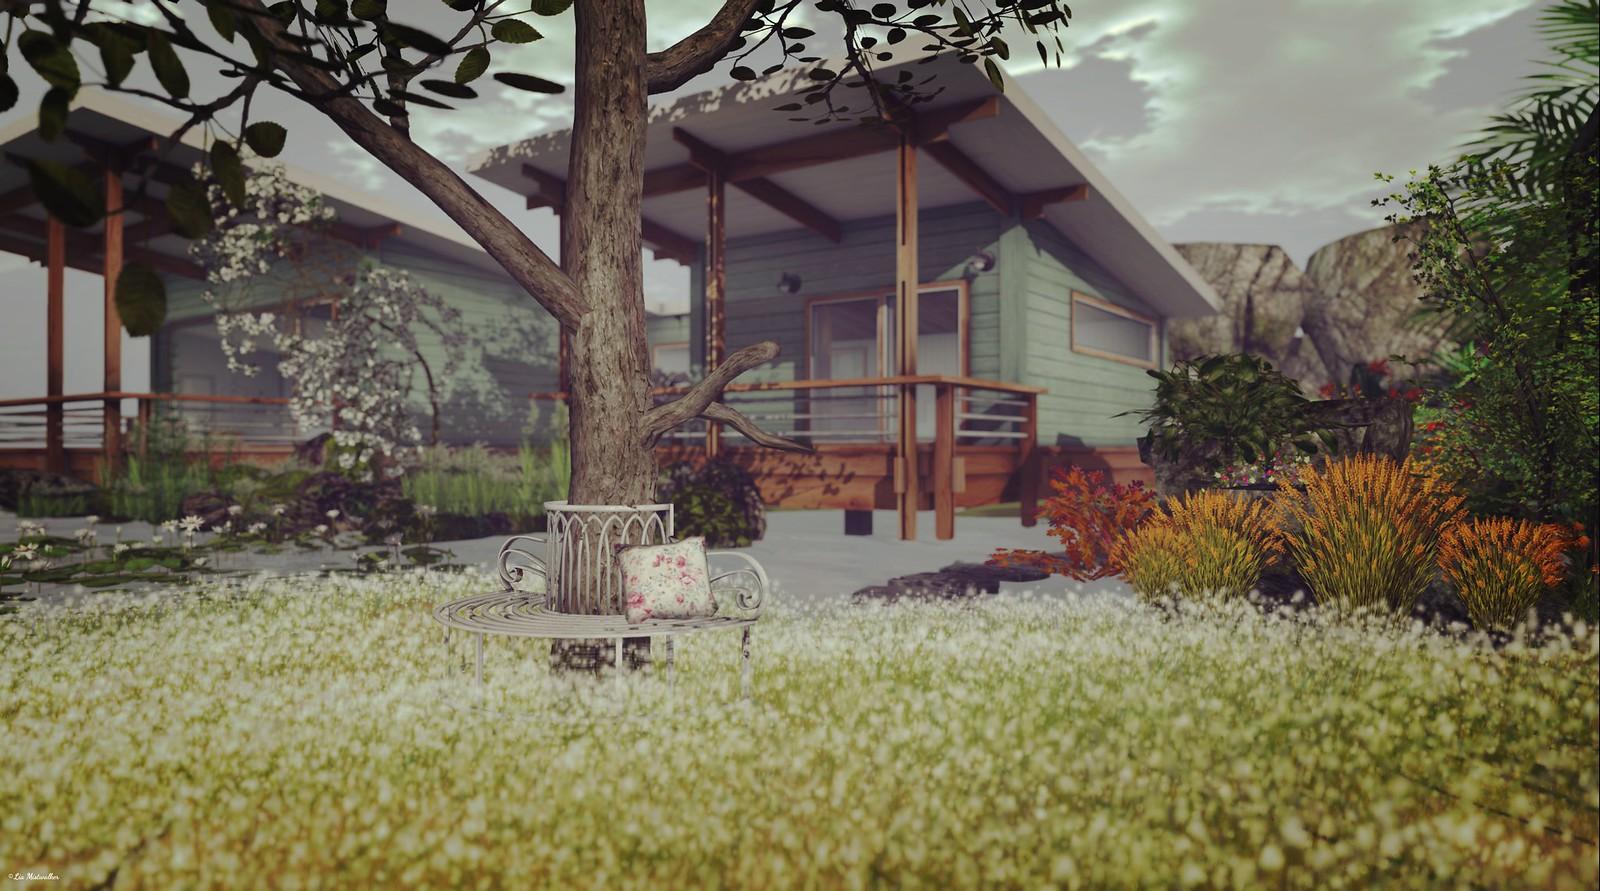 Home & Garden Therapy # 466